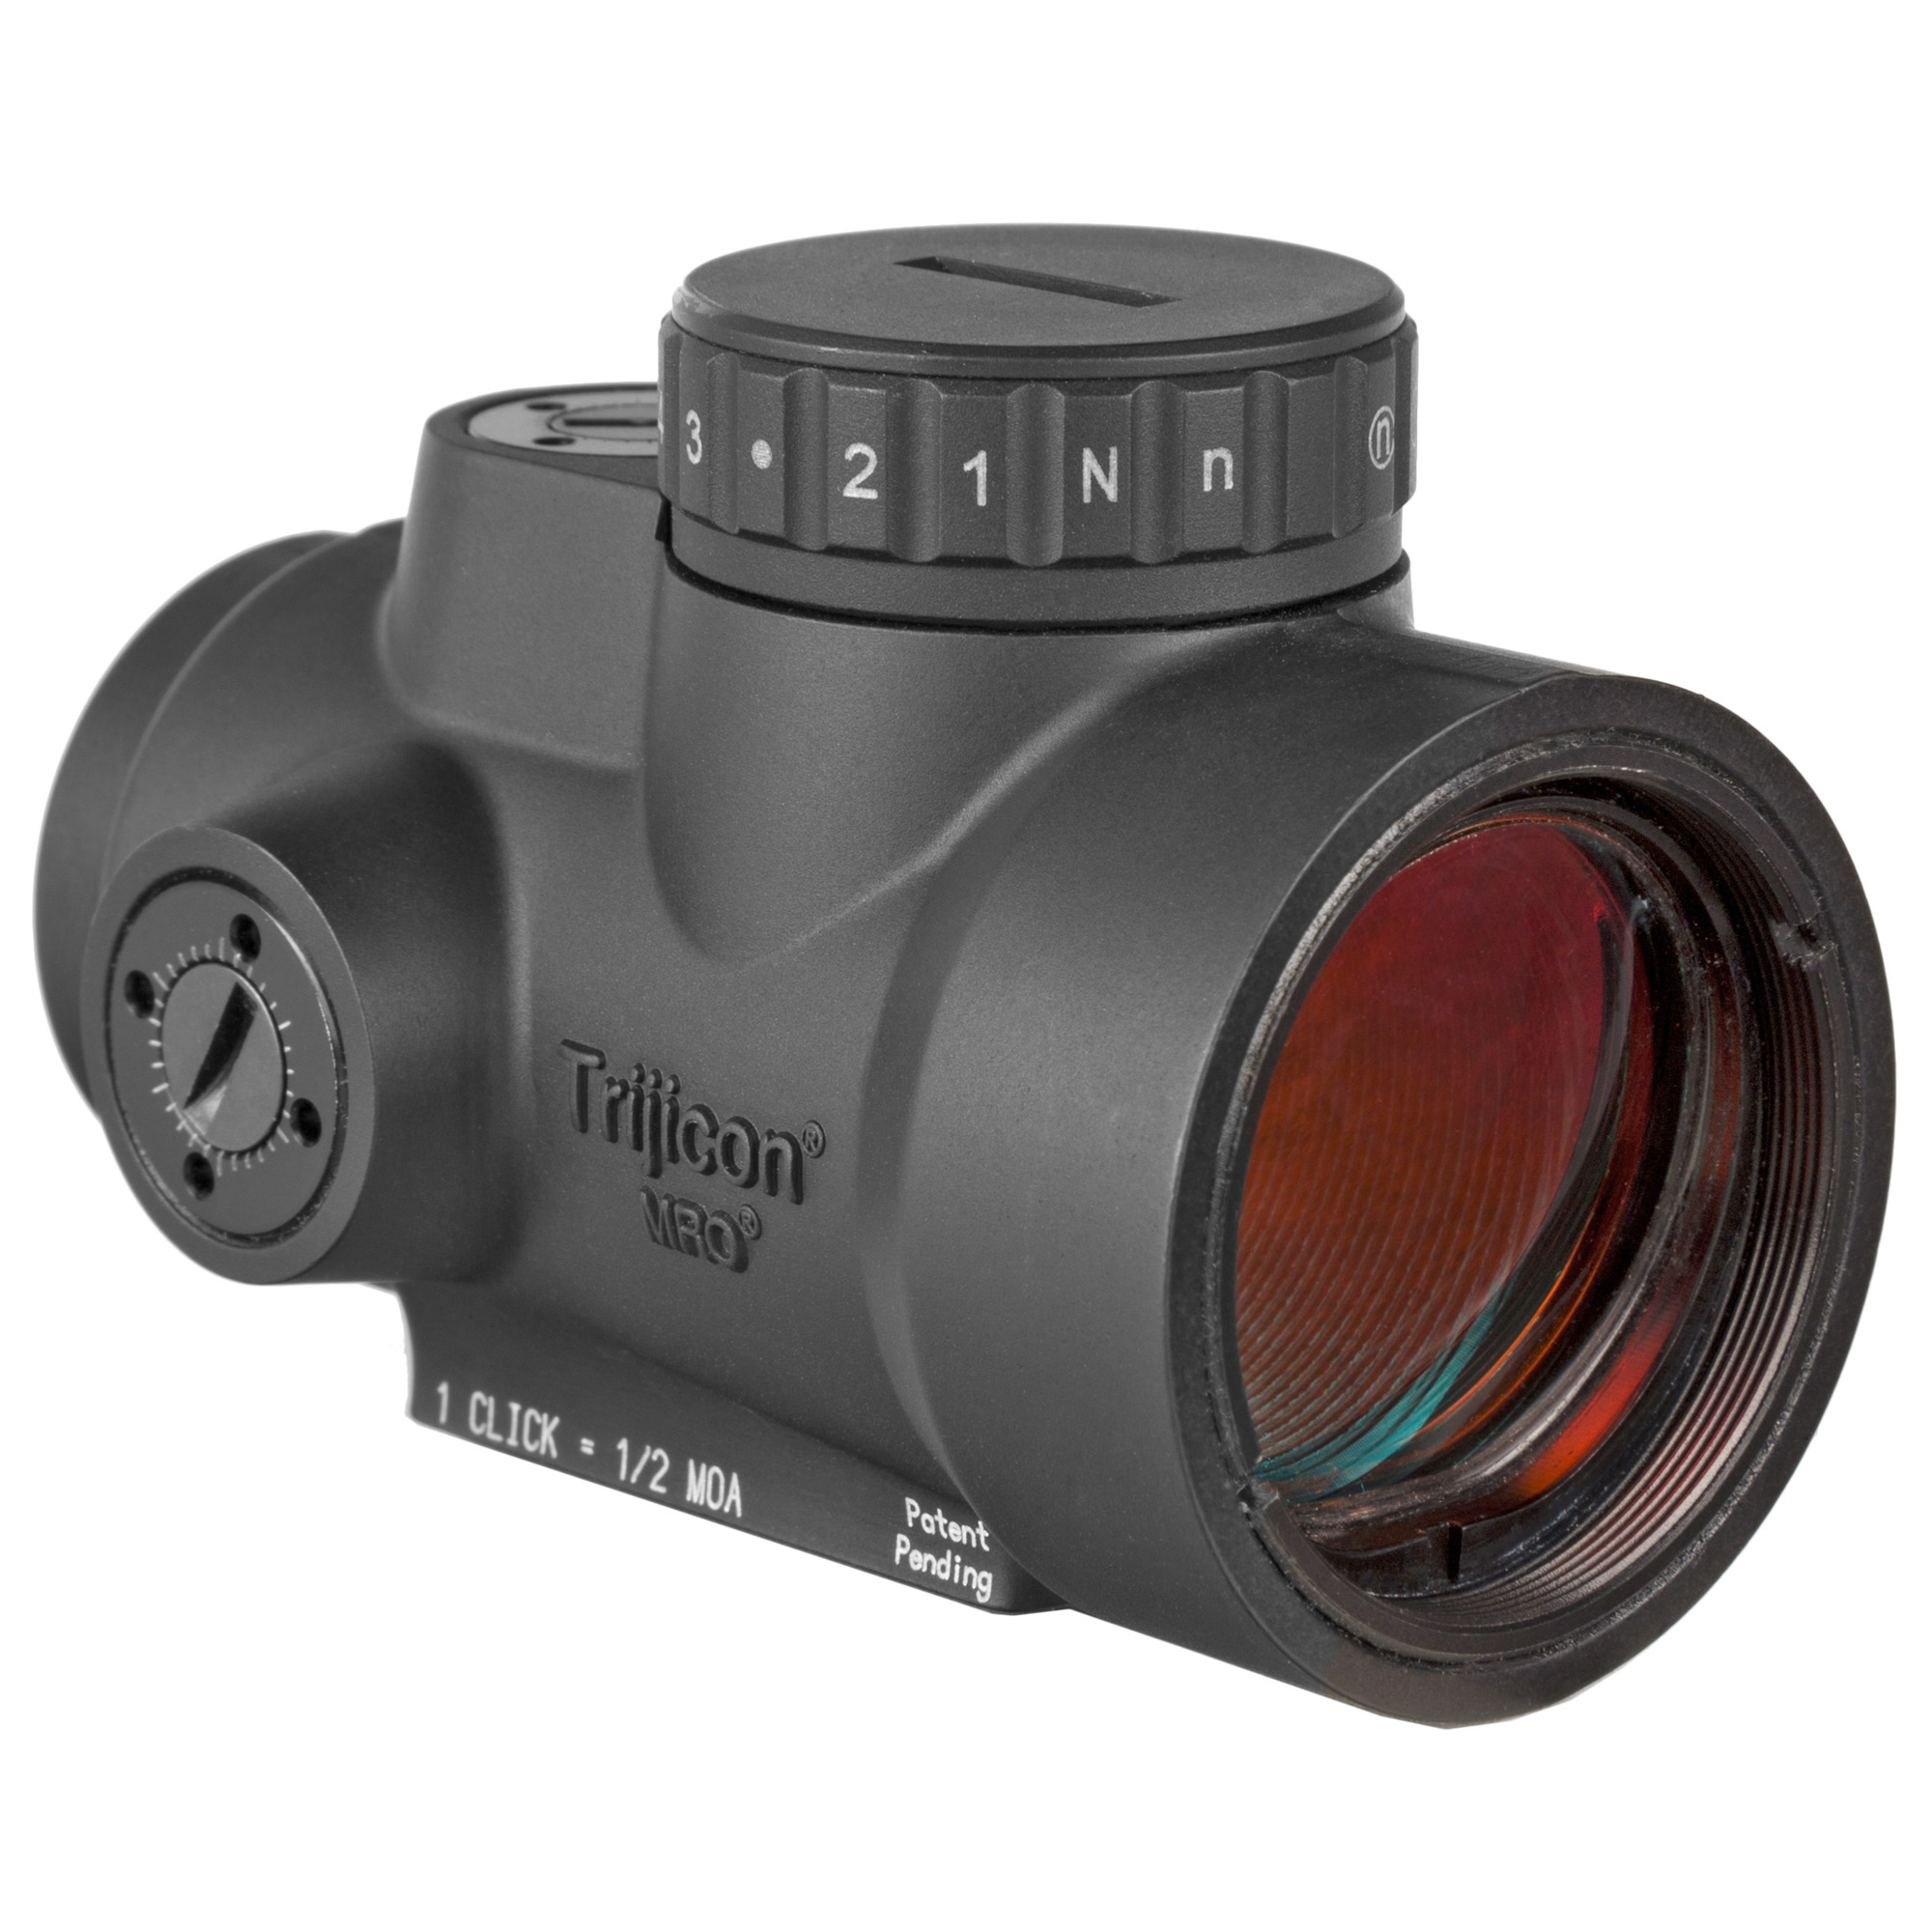 Trijicon MRO HD Red Dot Sight - MSR Arms 1